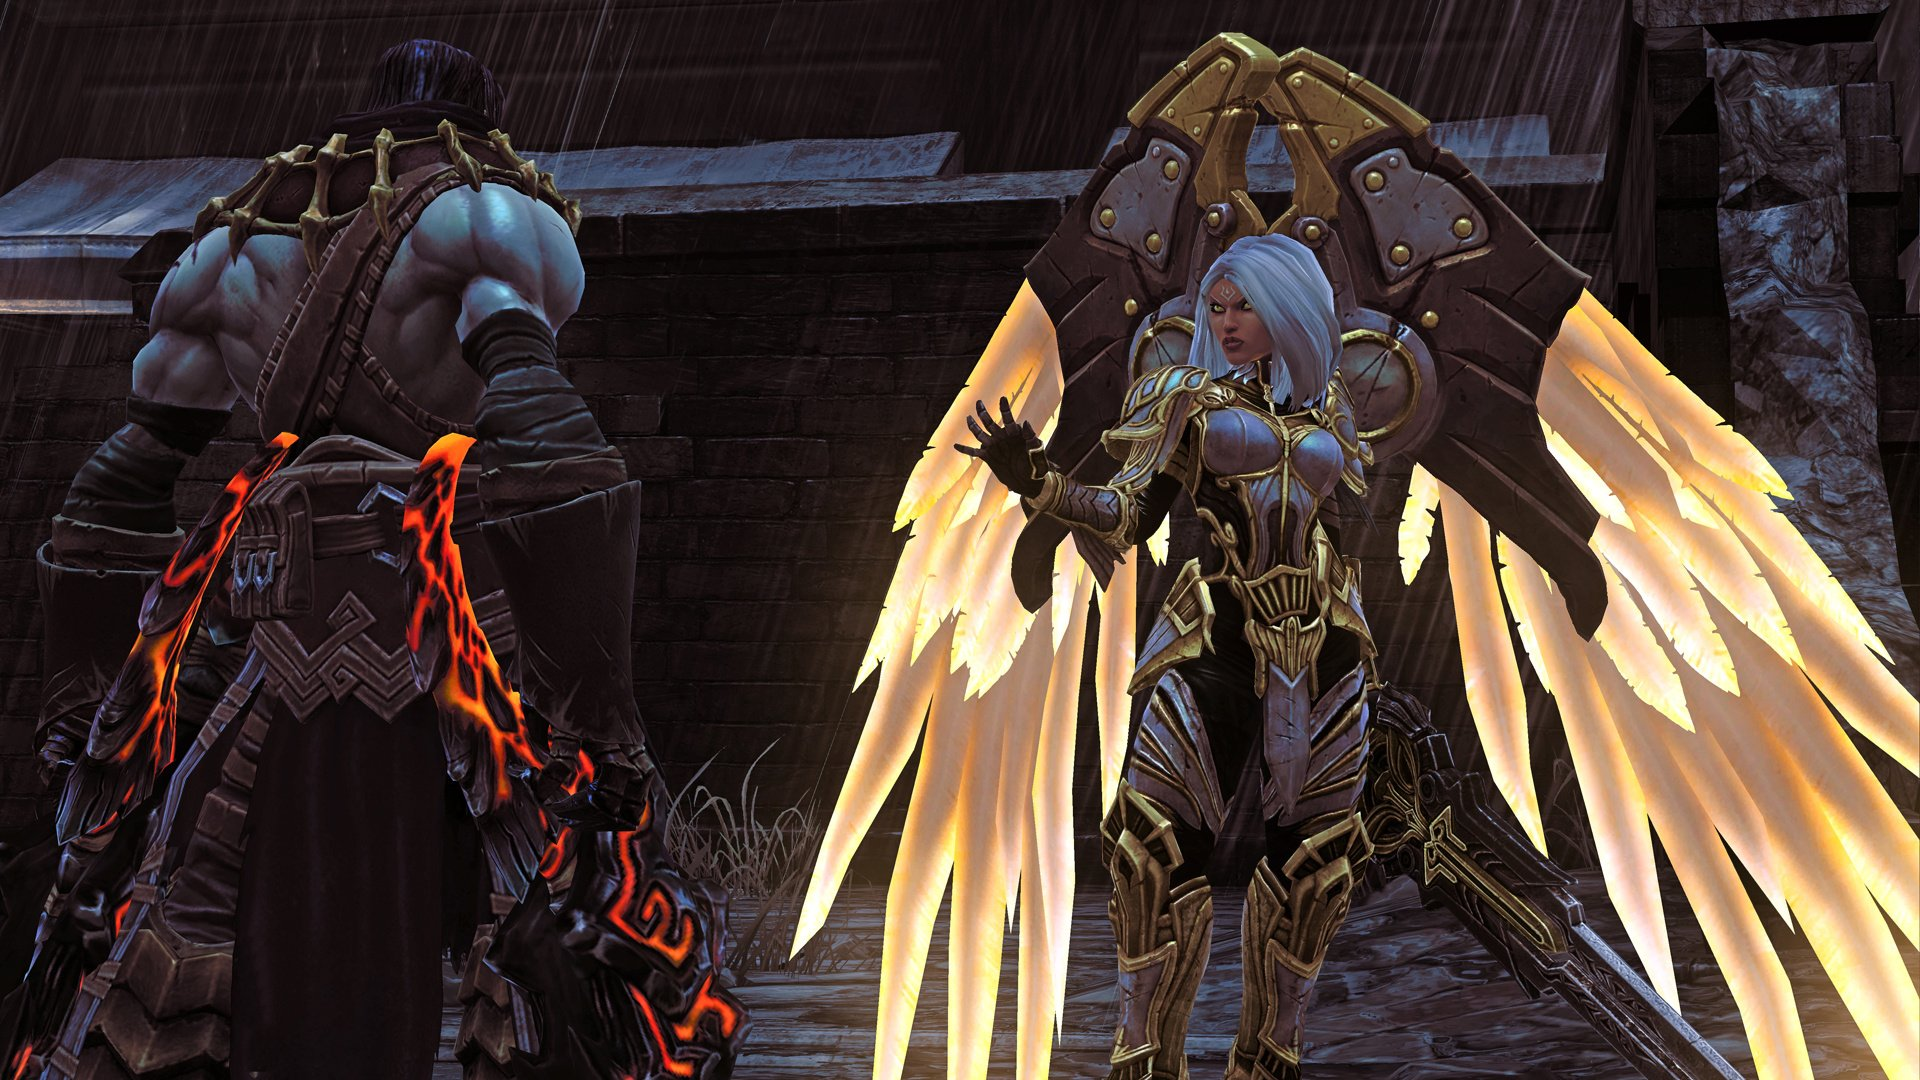 http://images.nintendolife.com/screenshots/42554/large.jpg